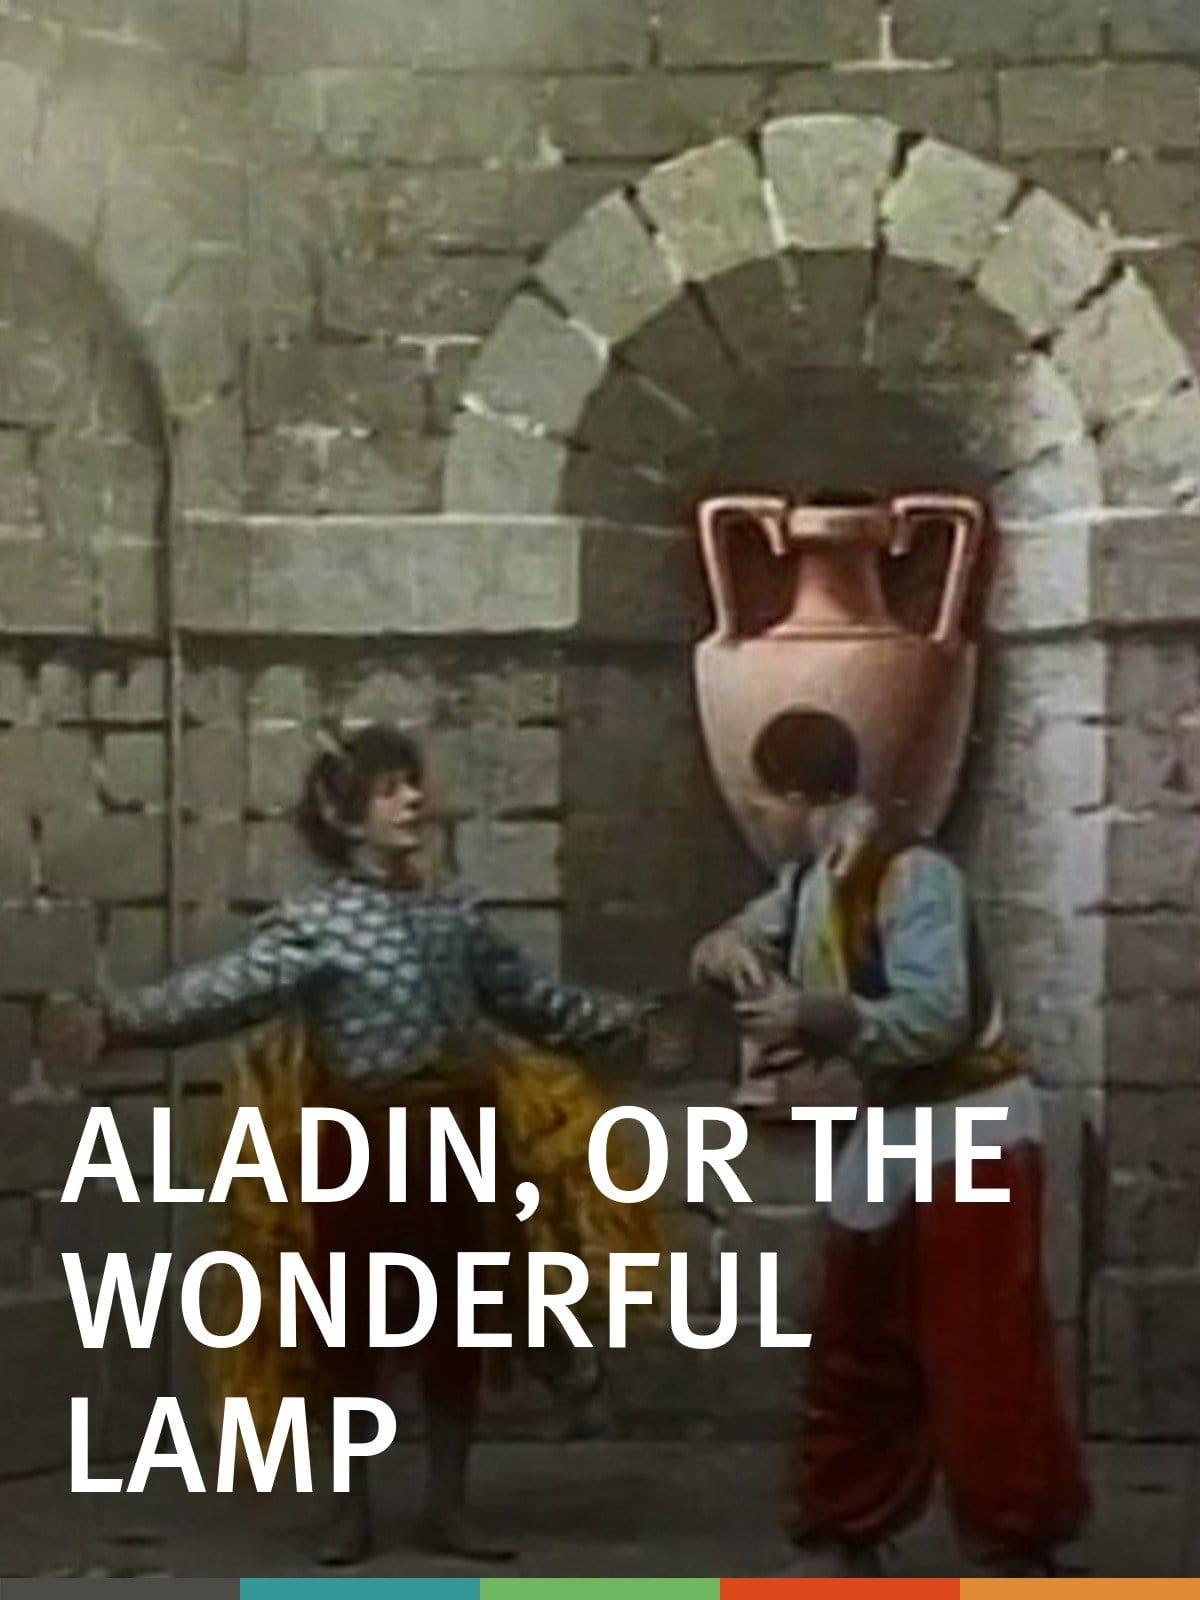 Aladdin and His Wonder Lamp (1906)